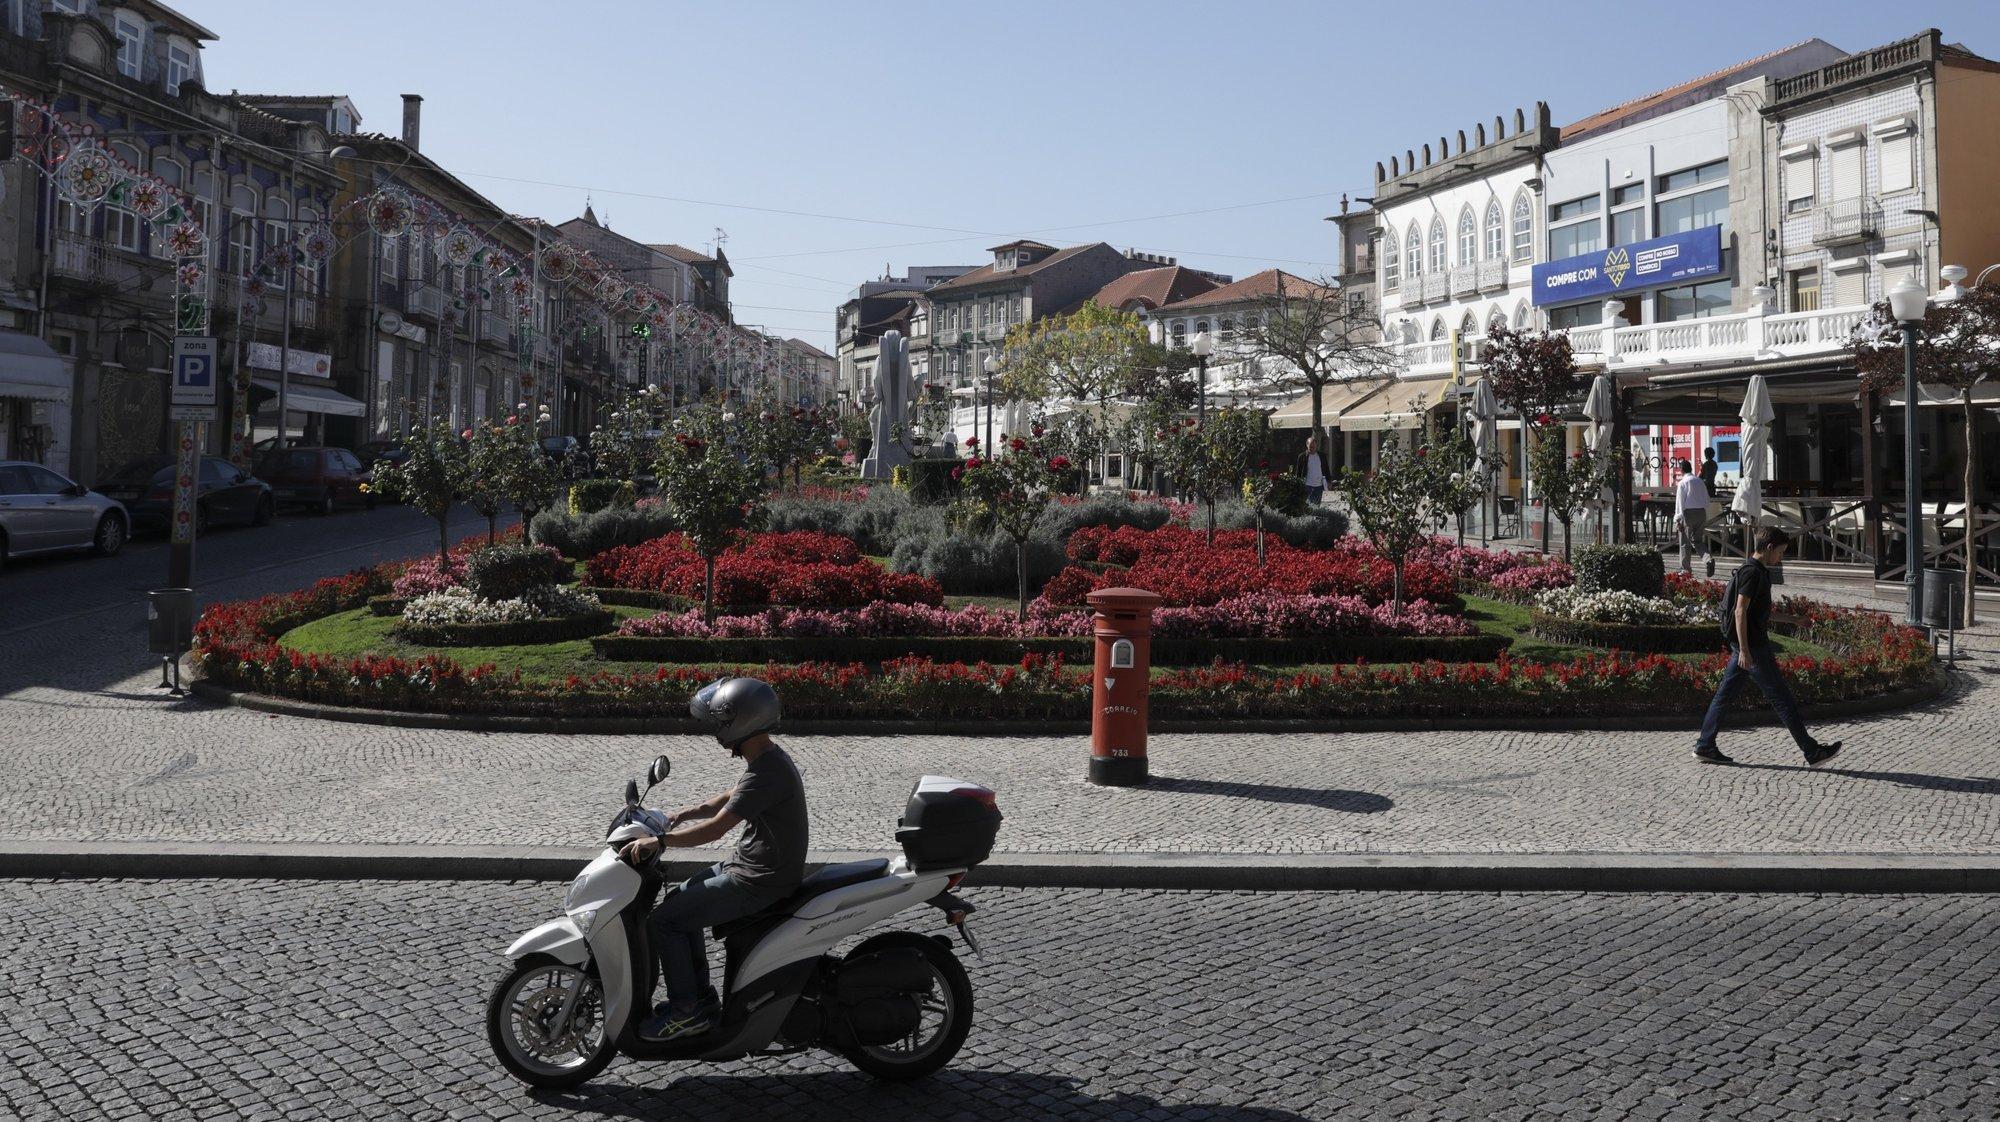 Largo Coronel Baptista Coelho, Santo Tirso, 4 de outubro de 2017. JOSÉ COELHO/LUSA